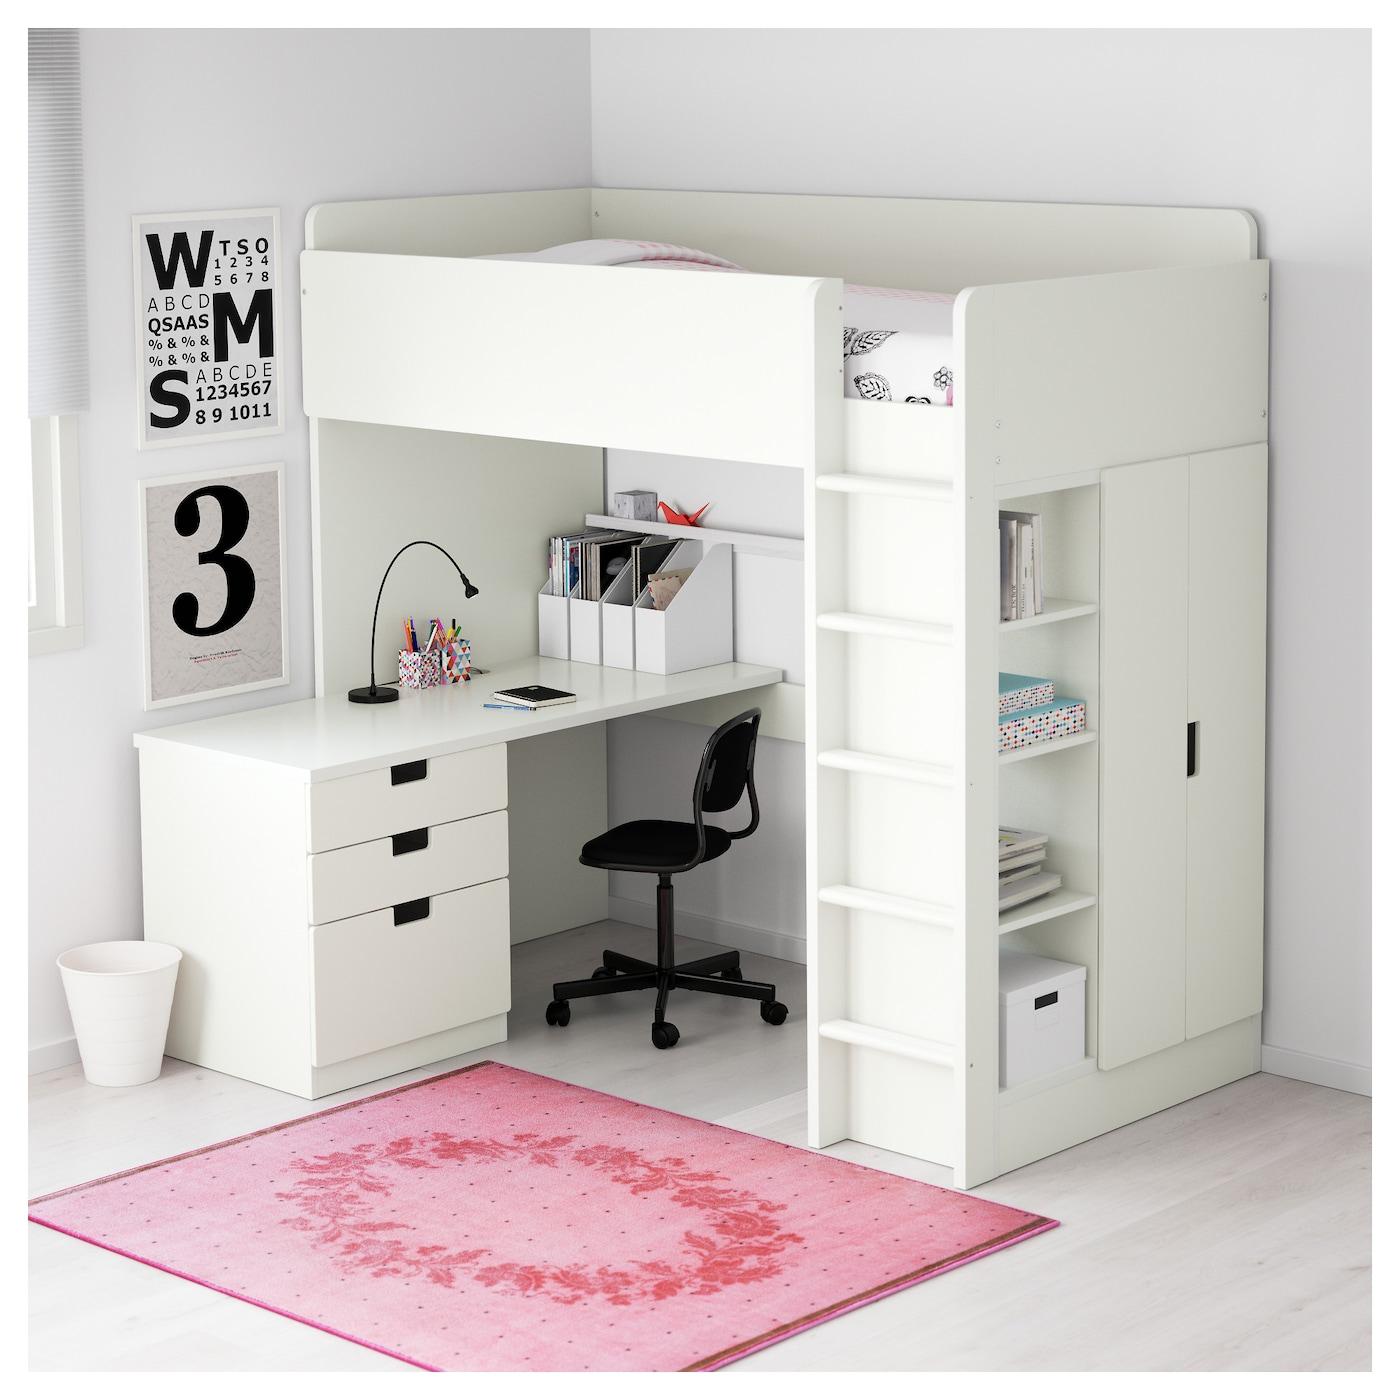 Kinderzimmer ikea stuva  STUVA Loft bed combo w 3 drawers/2 doors White 207x99x193 cm - IKEA